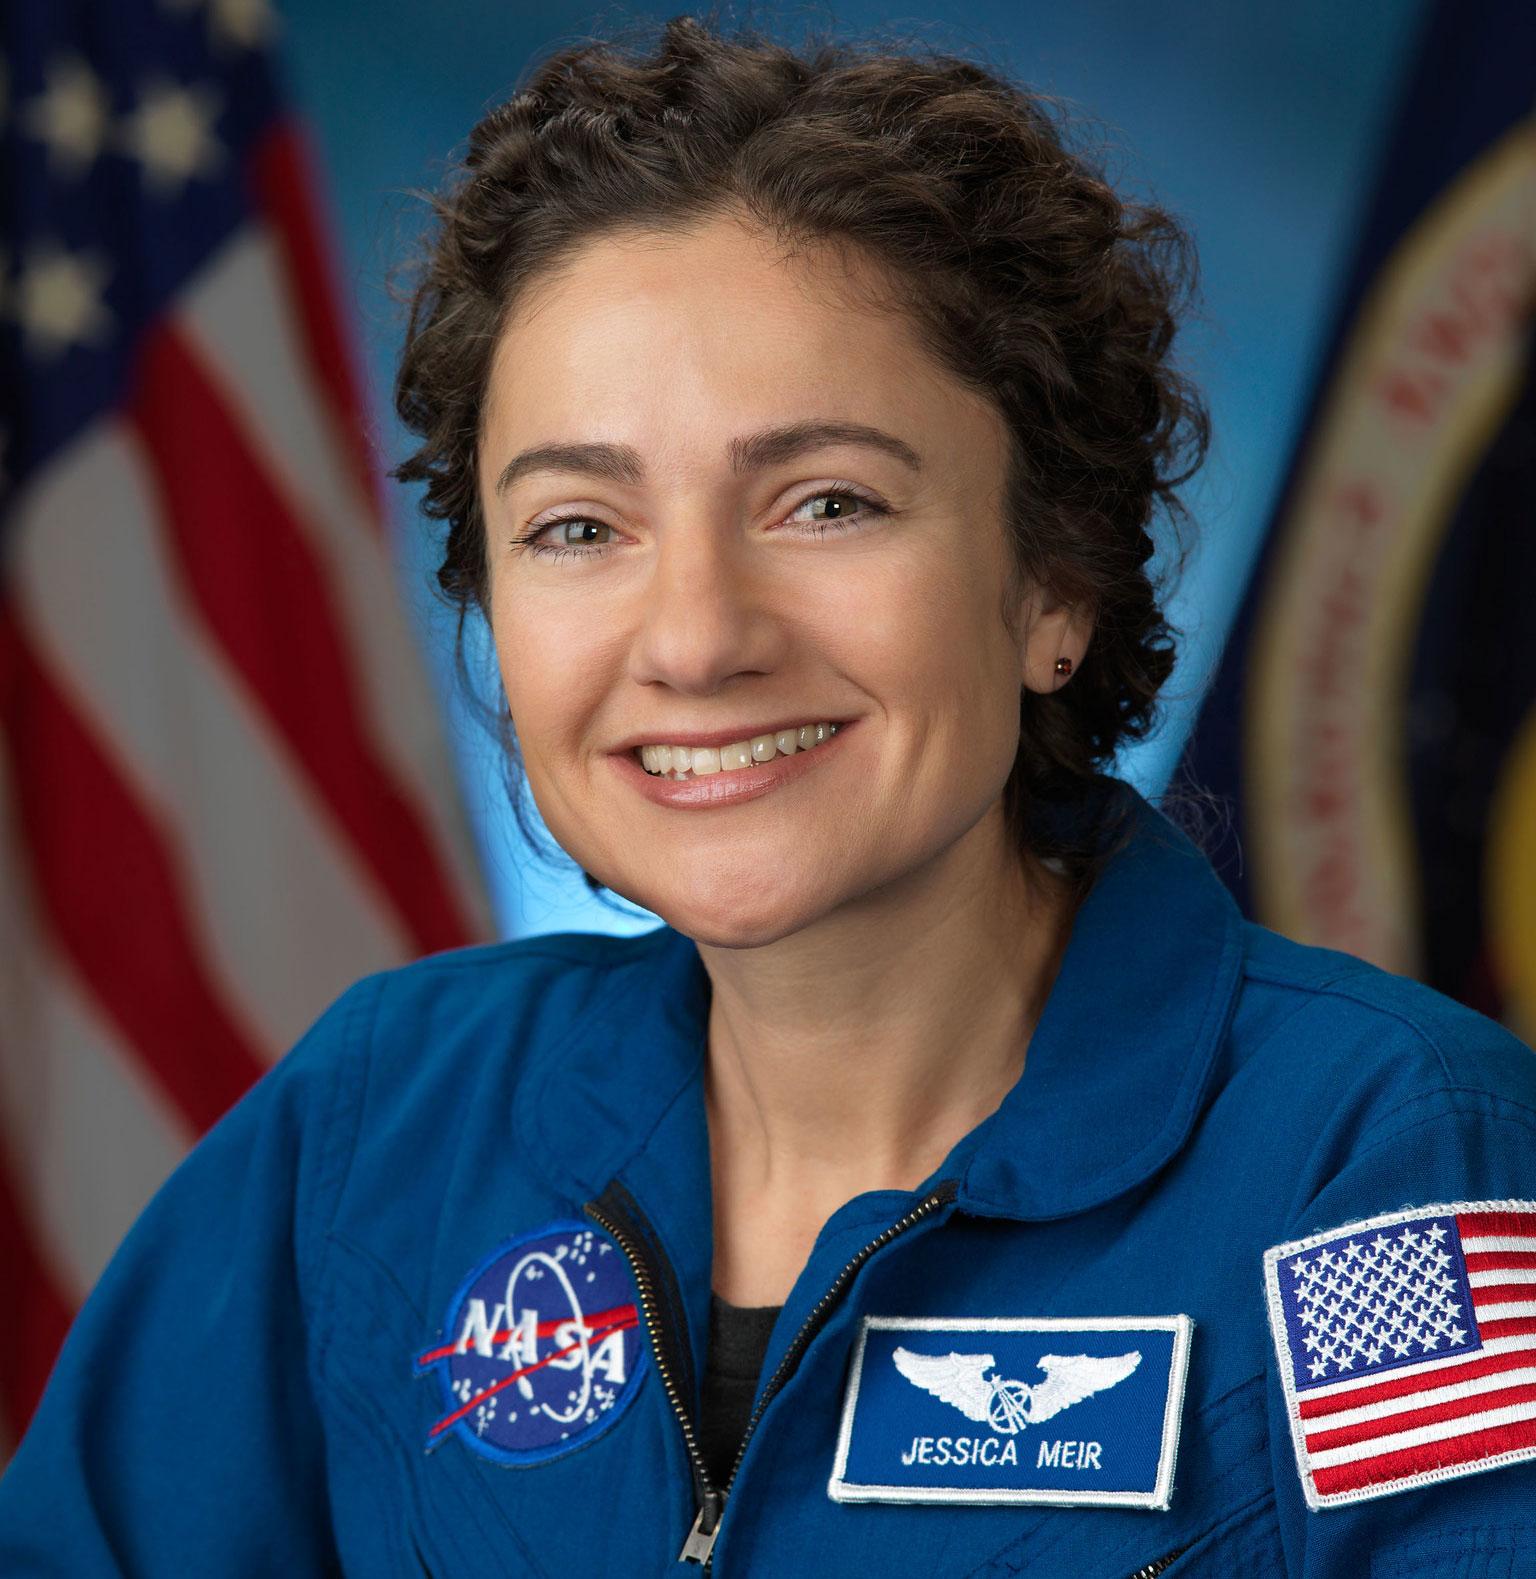 Jessica Meir in astronaut suit